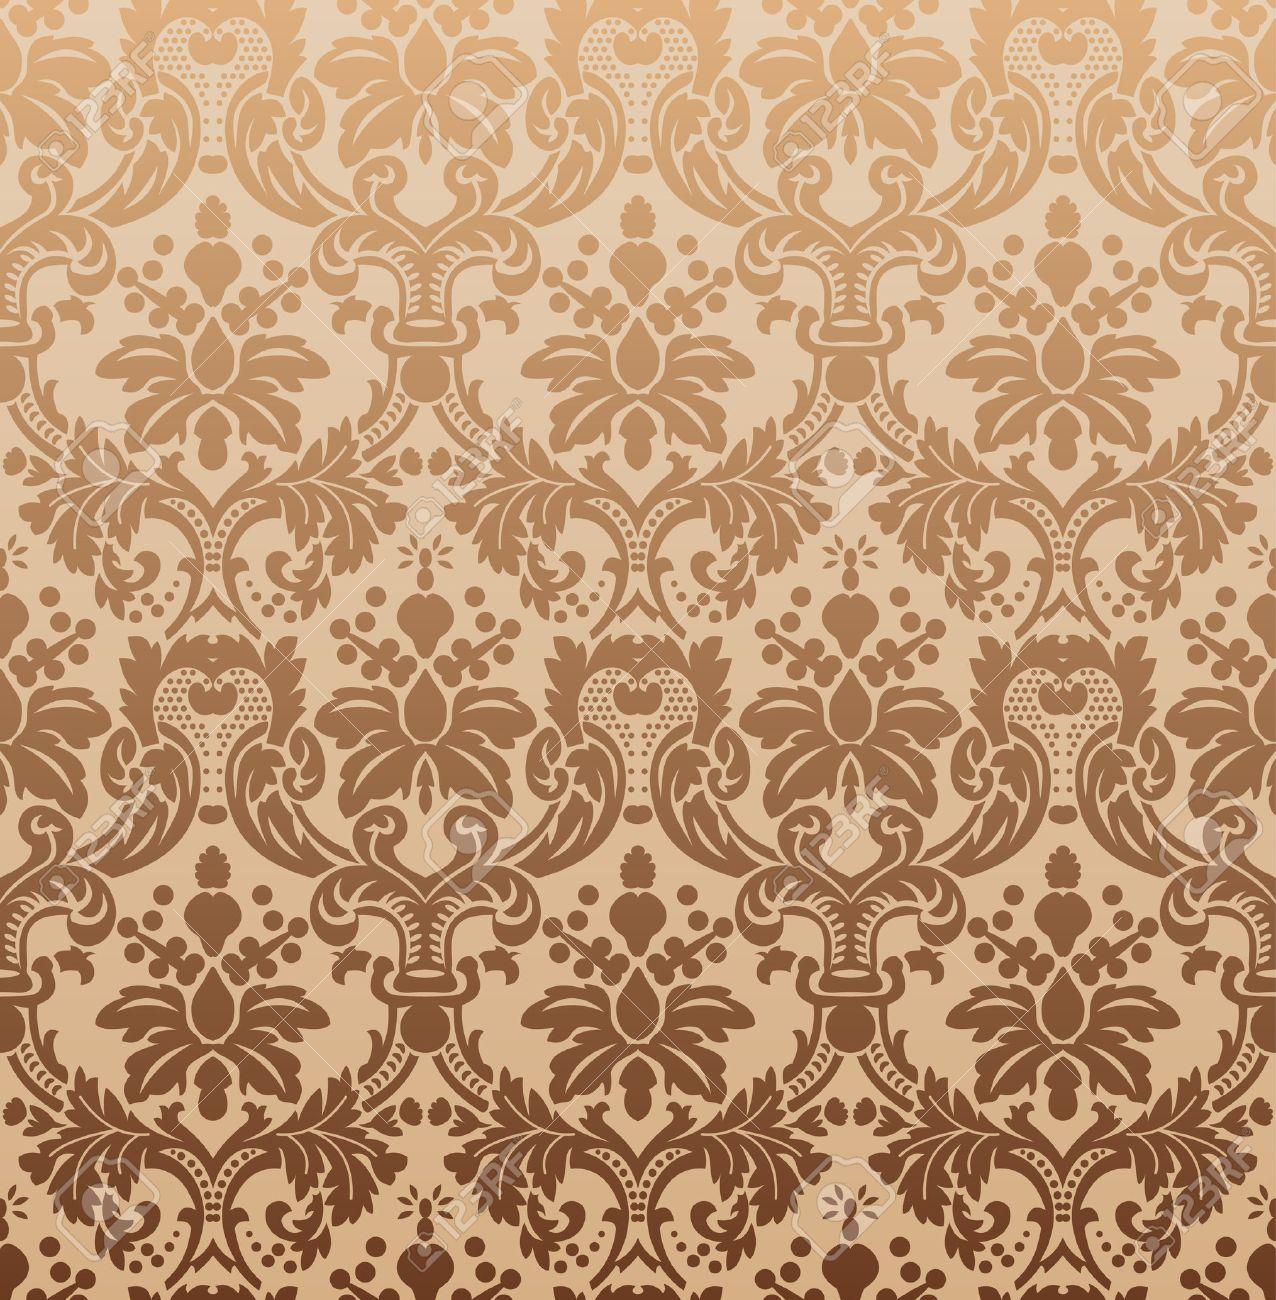 Imperial seamless wallpaper. Vector illustration Stock Vector - 6079277